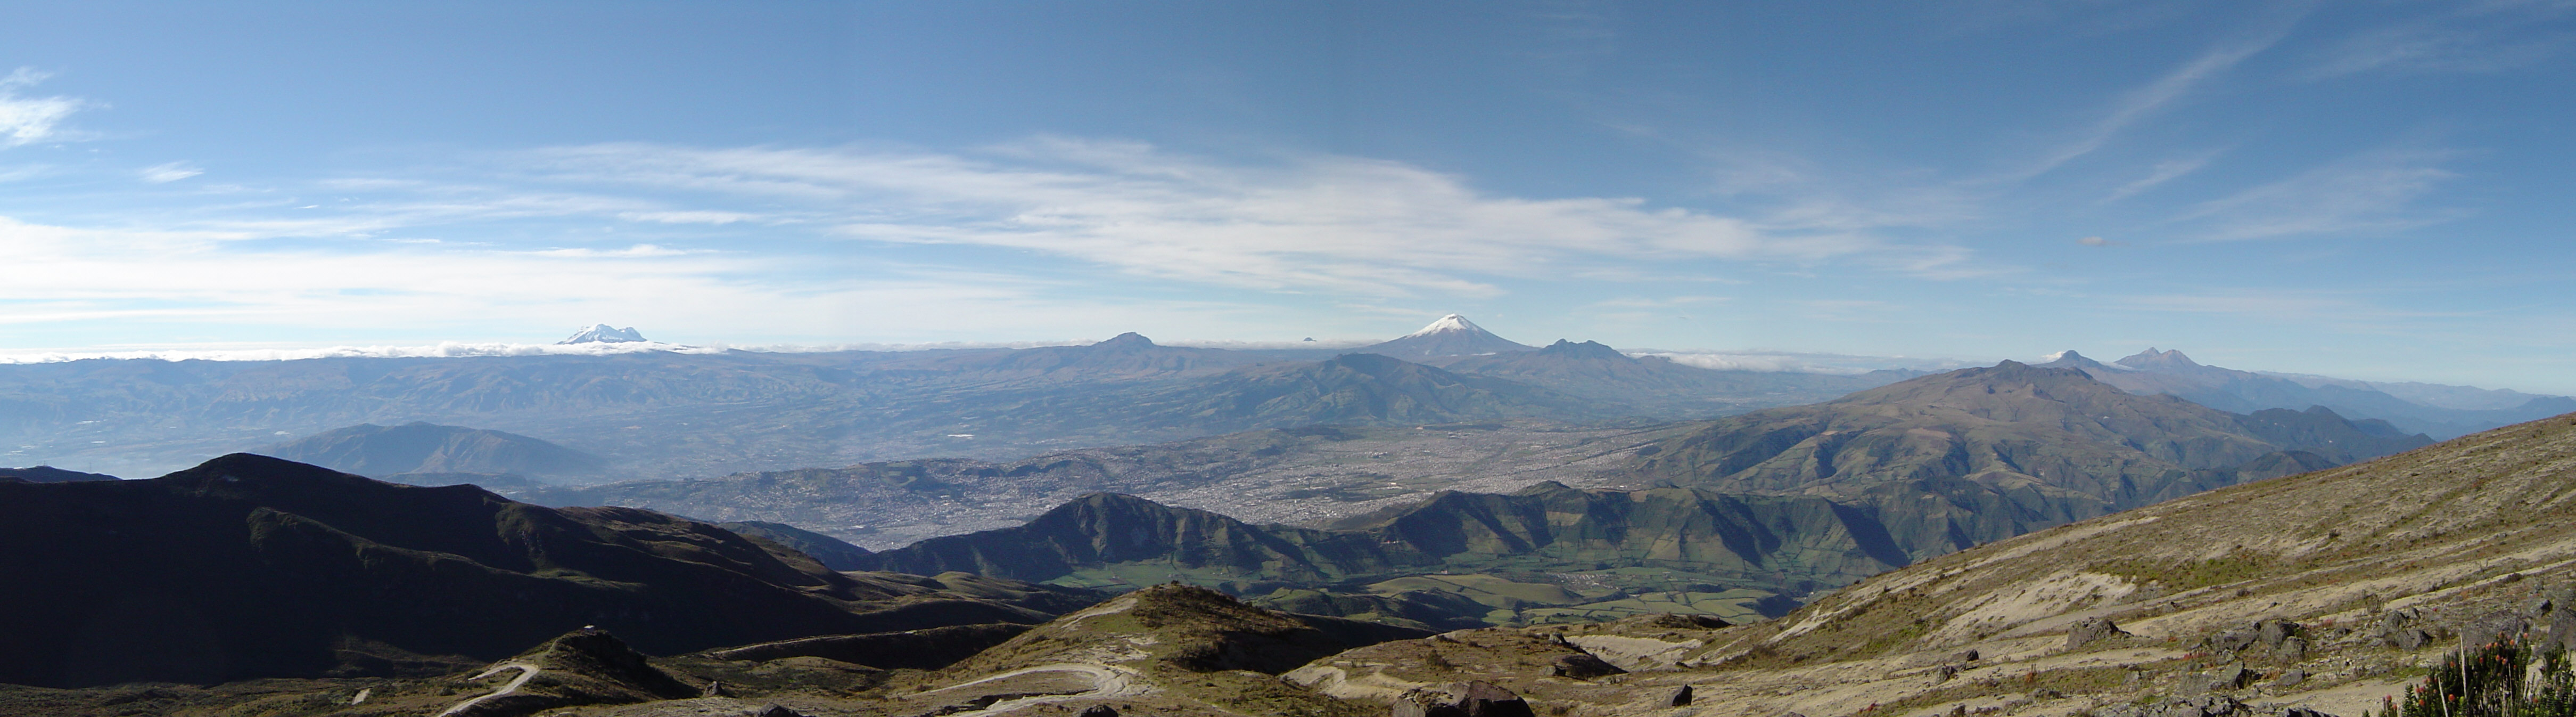 ecuador_panoramica